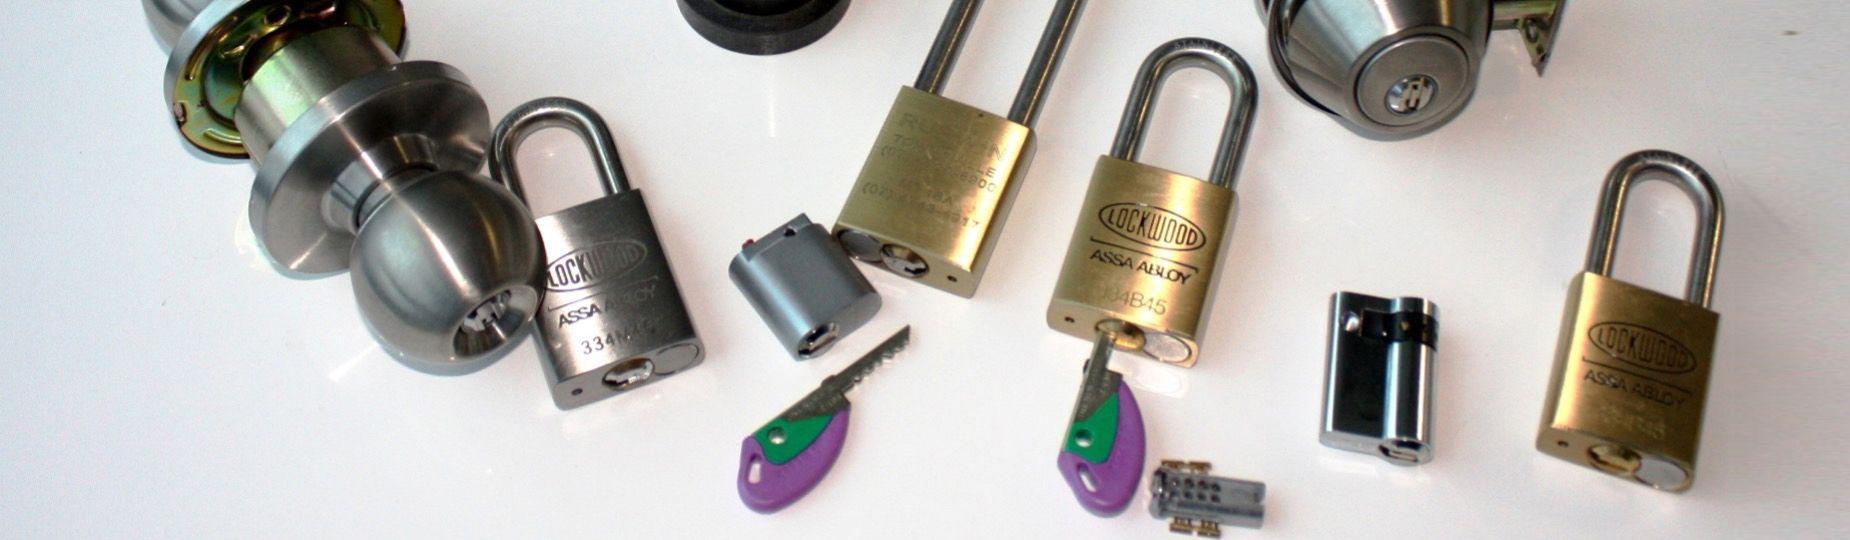 Restricted Master Key System